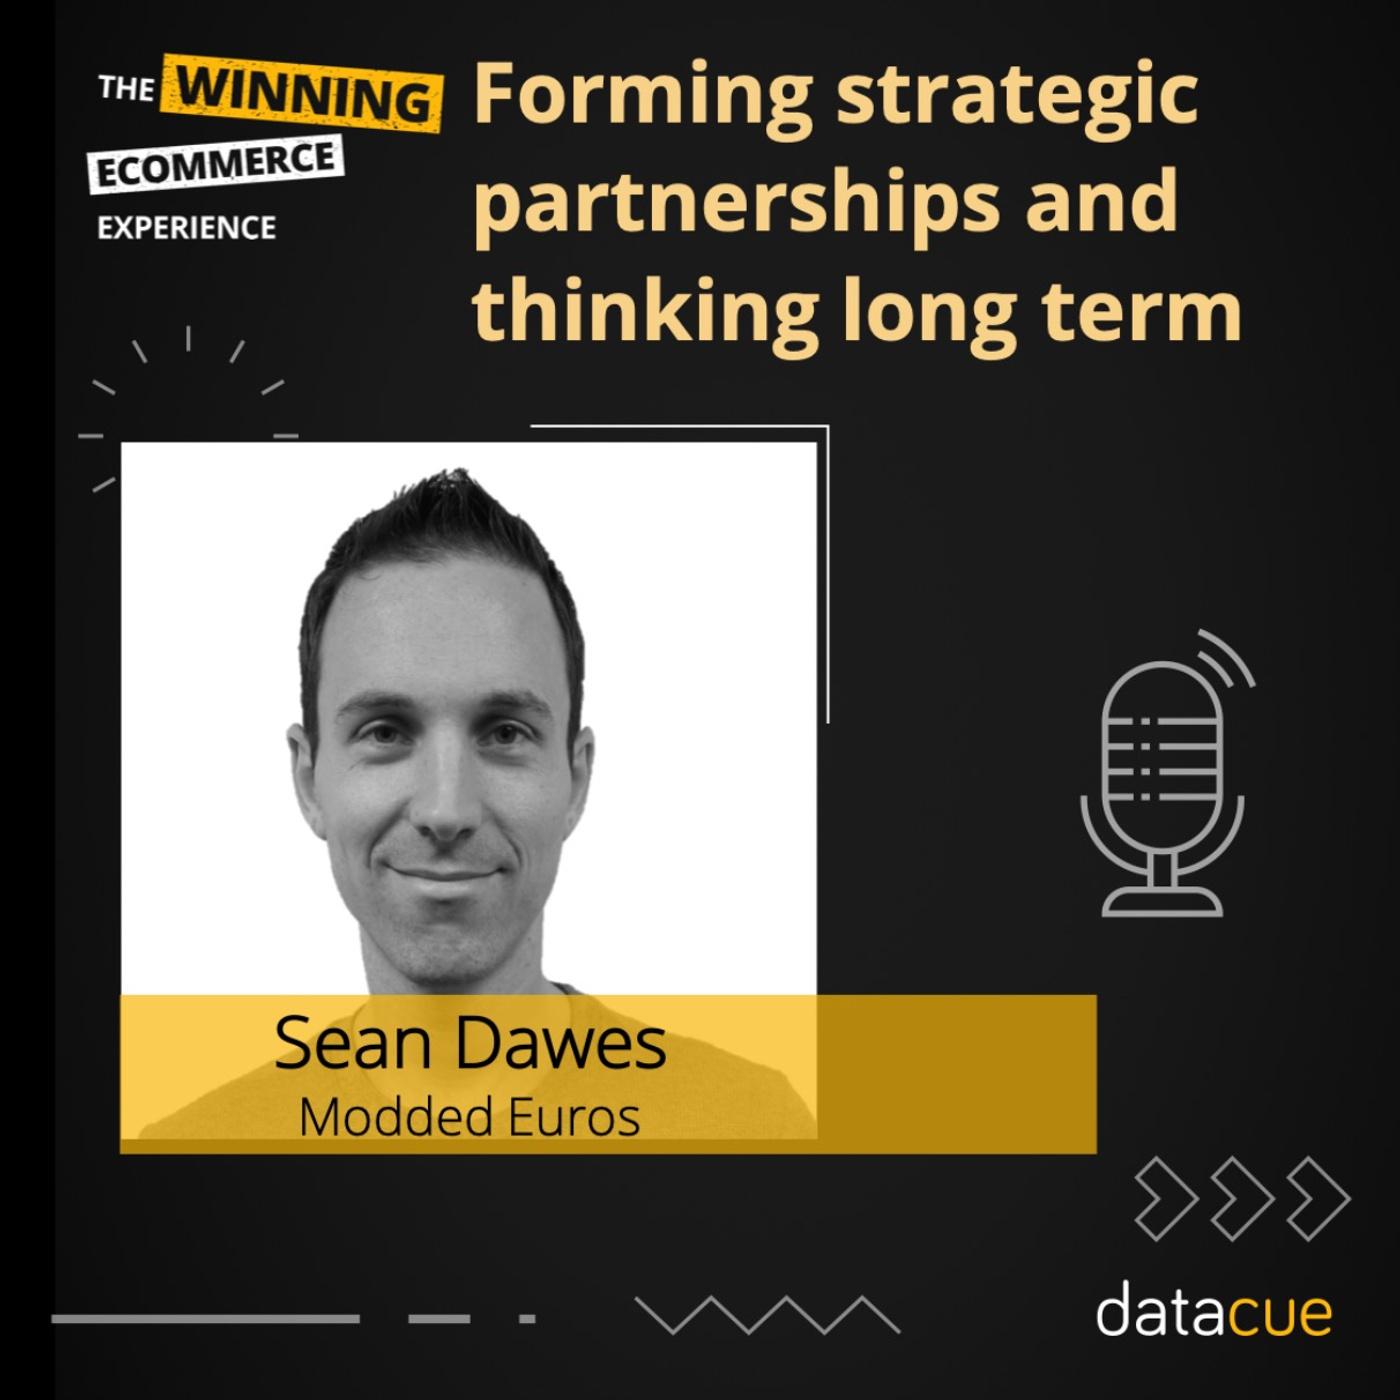 Sean Dawes